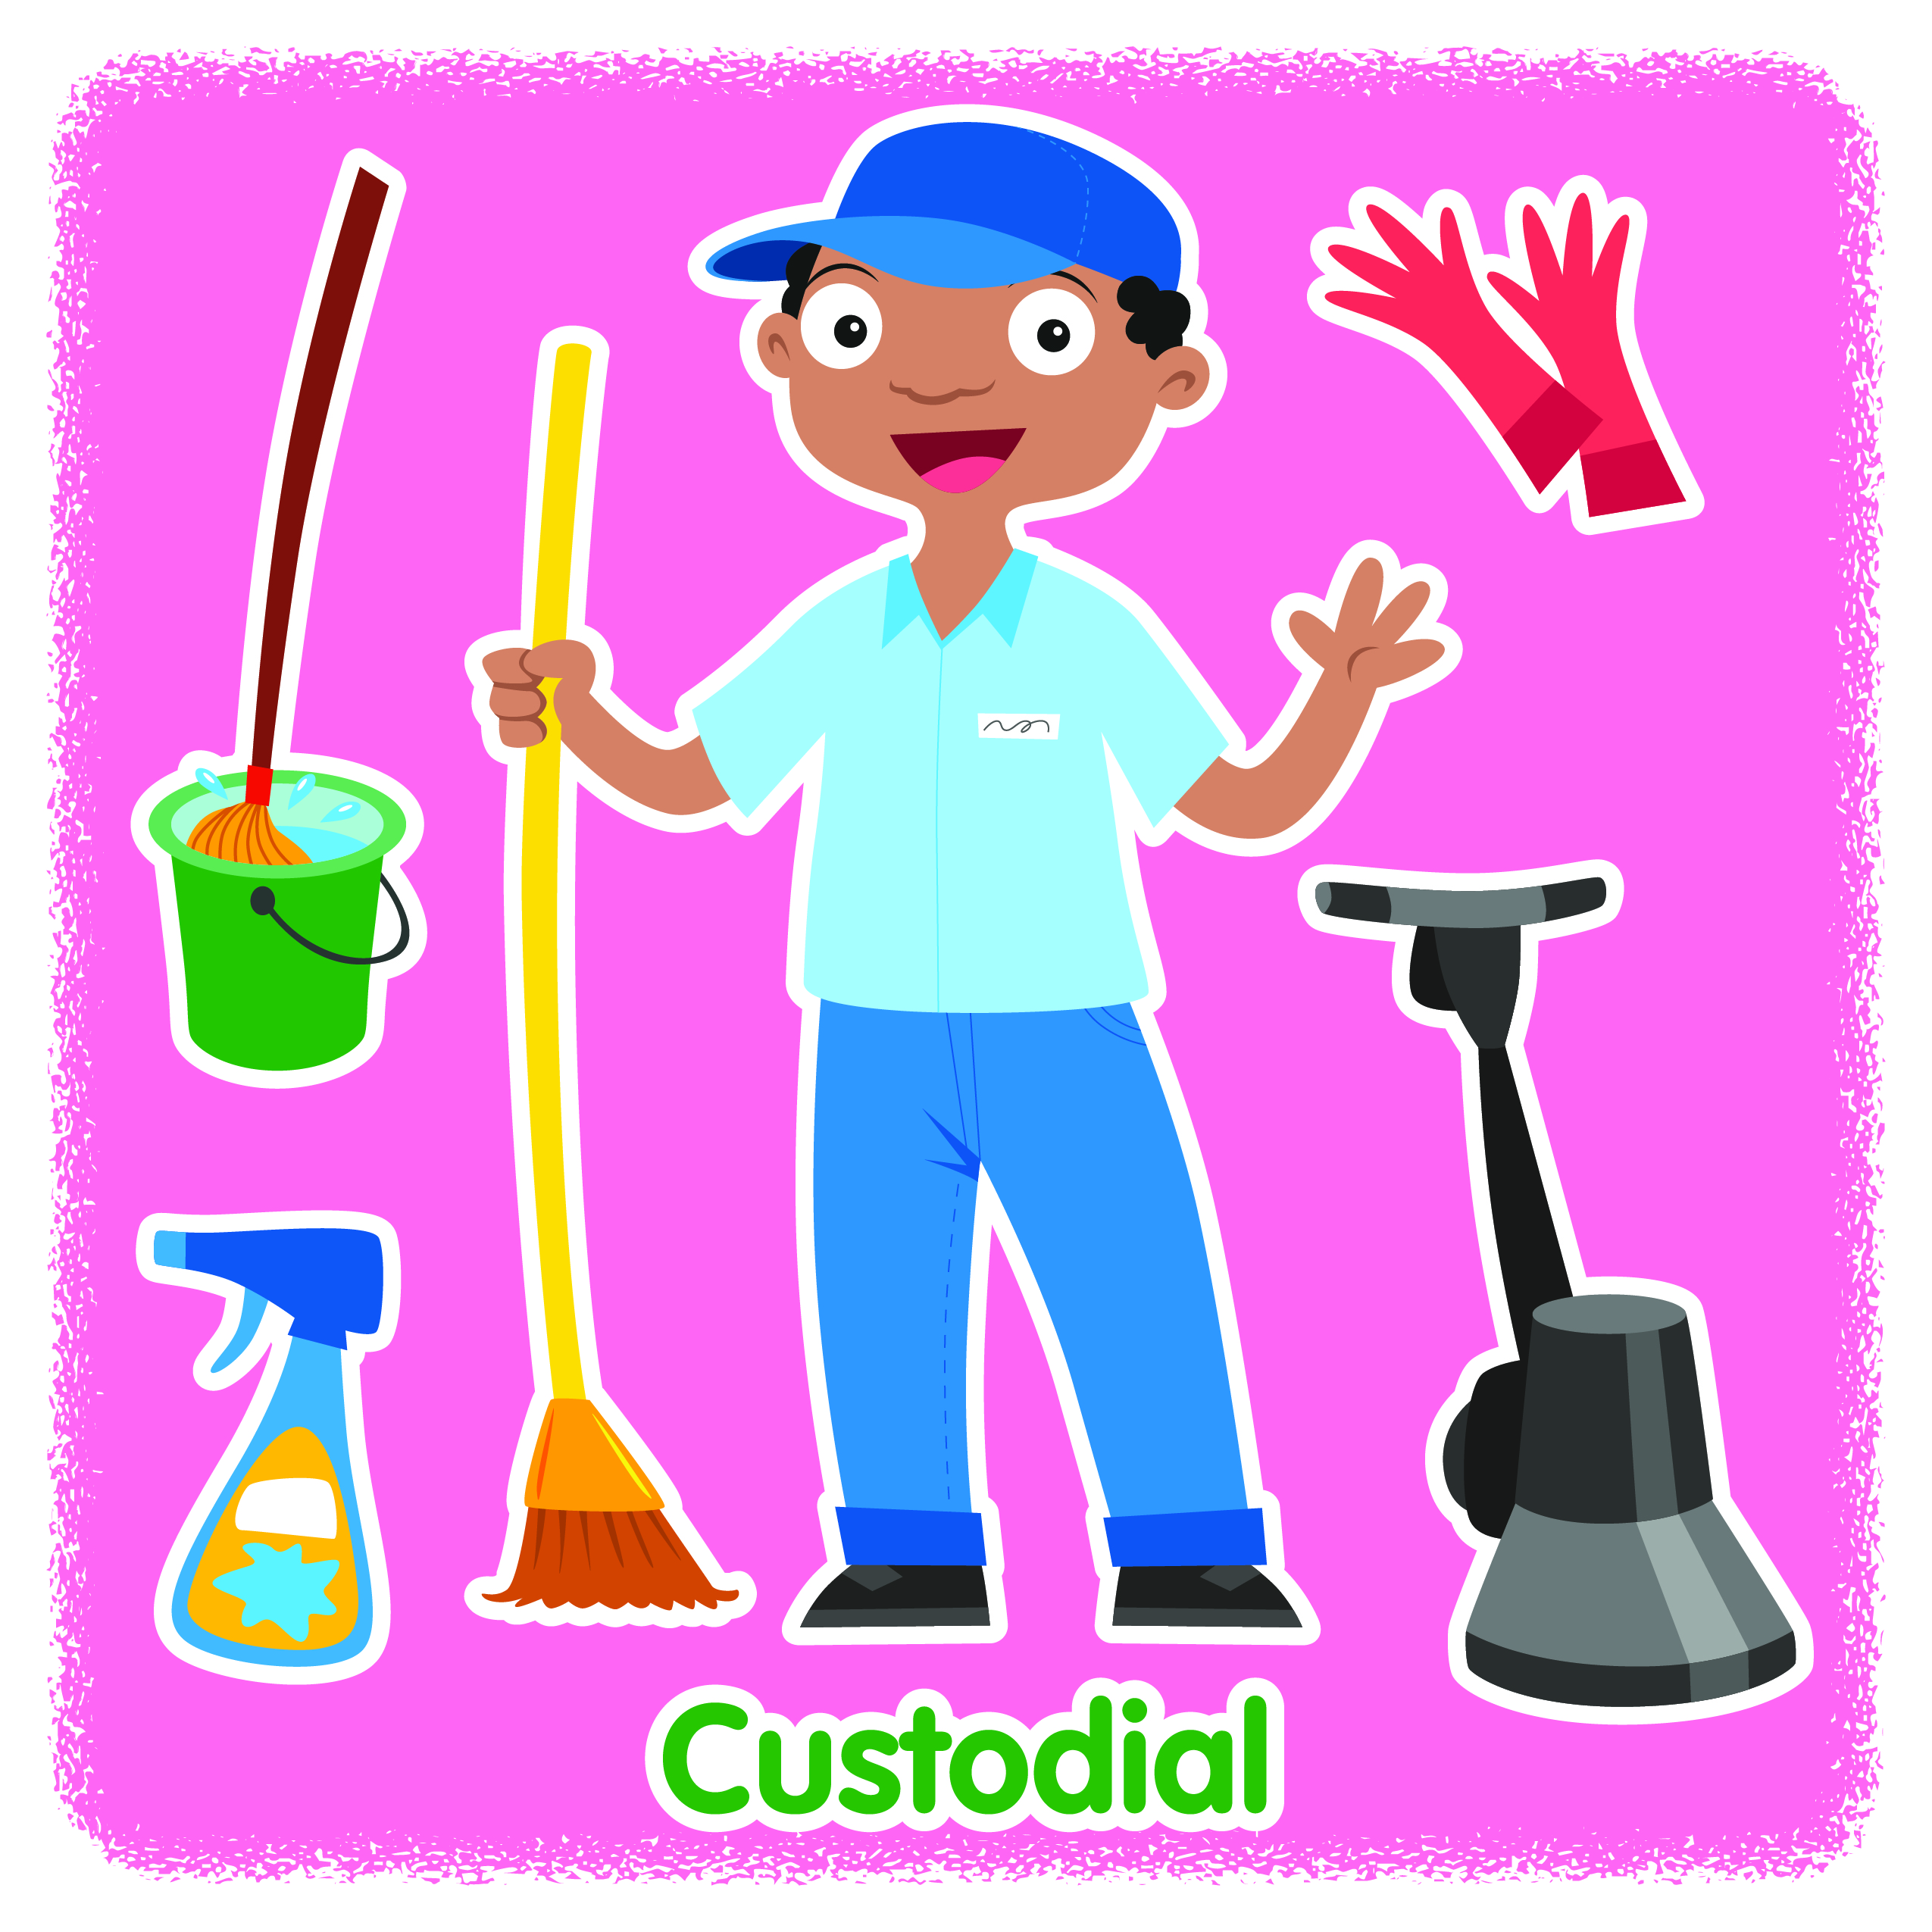 Free Custodian Uniform Cliparts, Download Free Clip Art, Free Clip.